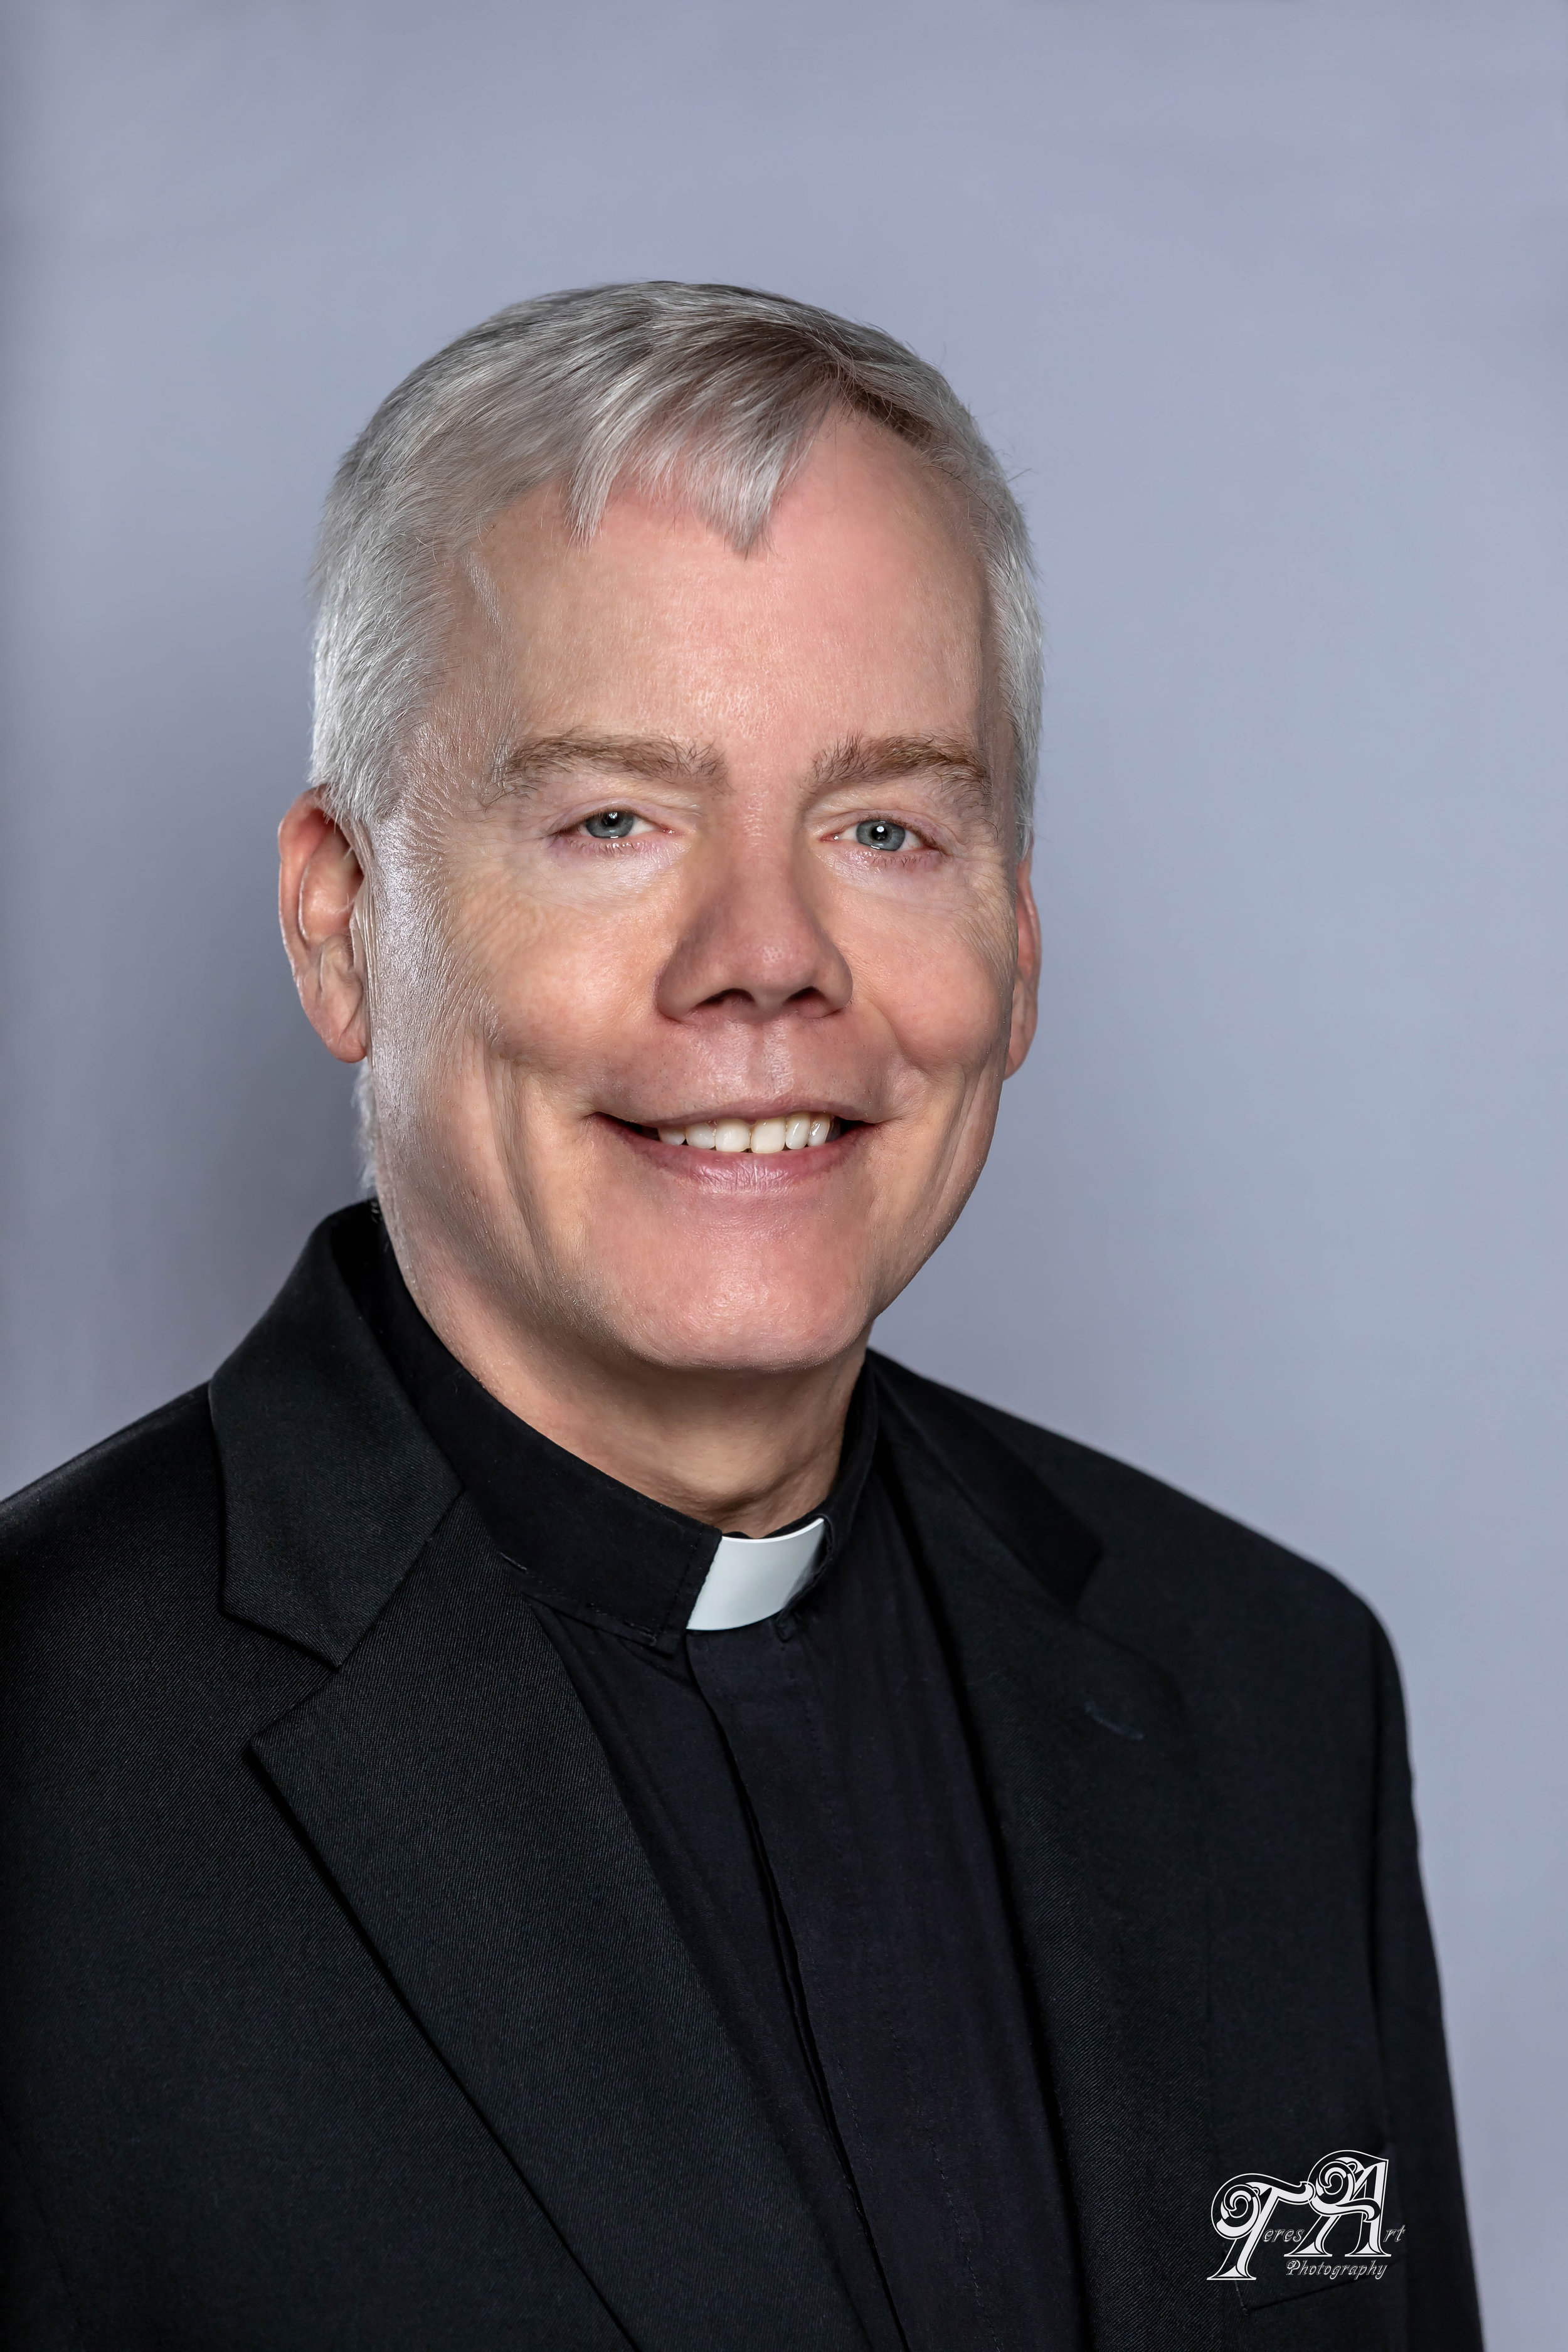 Fr. Michael Field - PastorEmail: MField@StBridgetUP.org